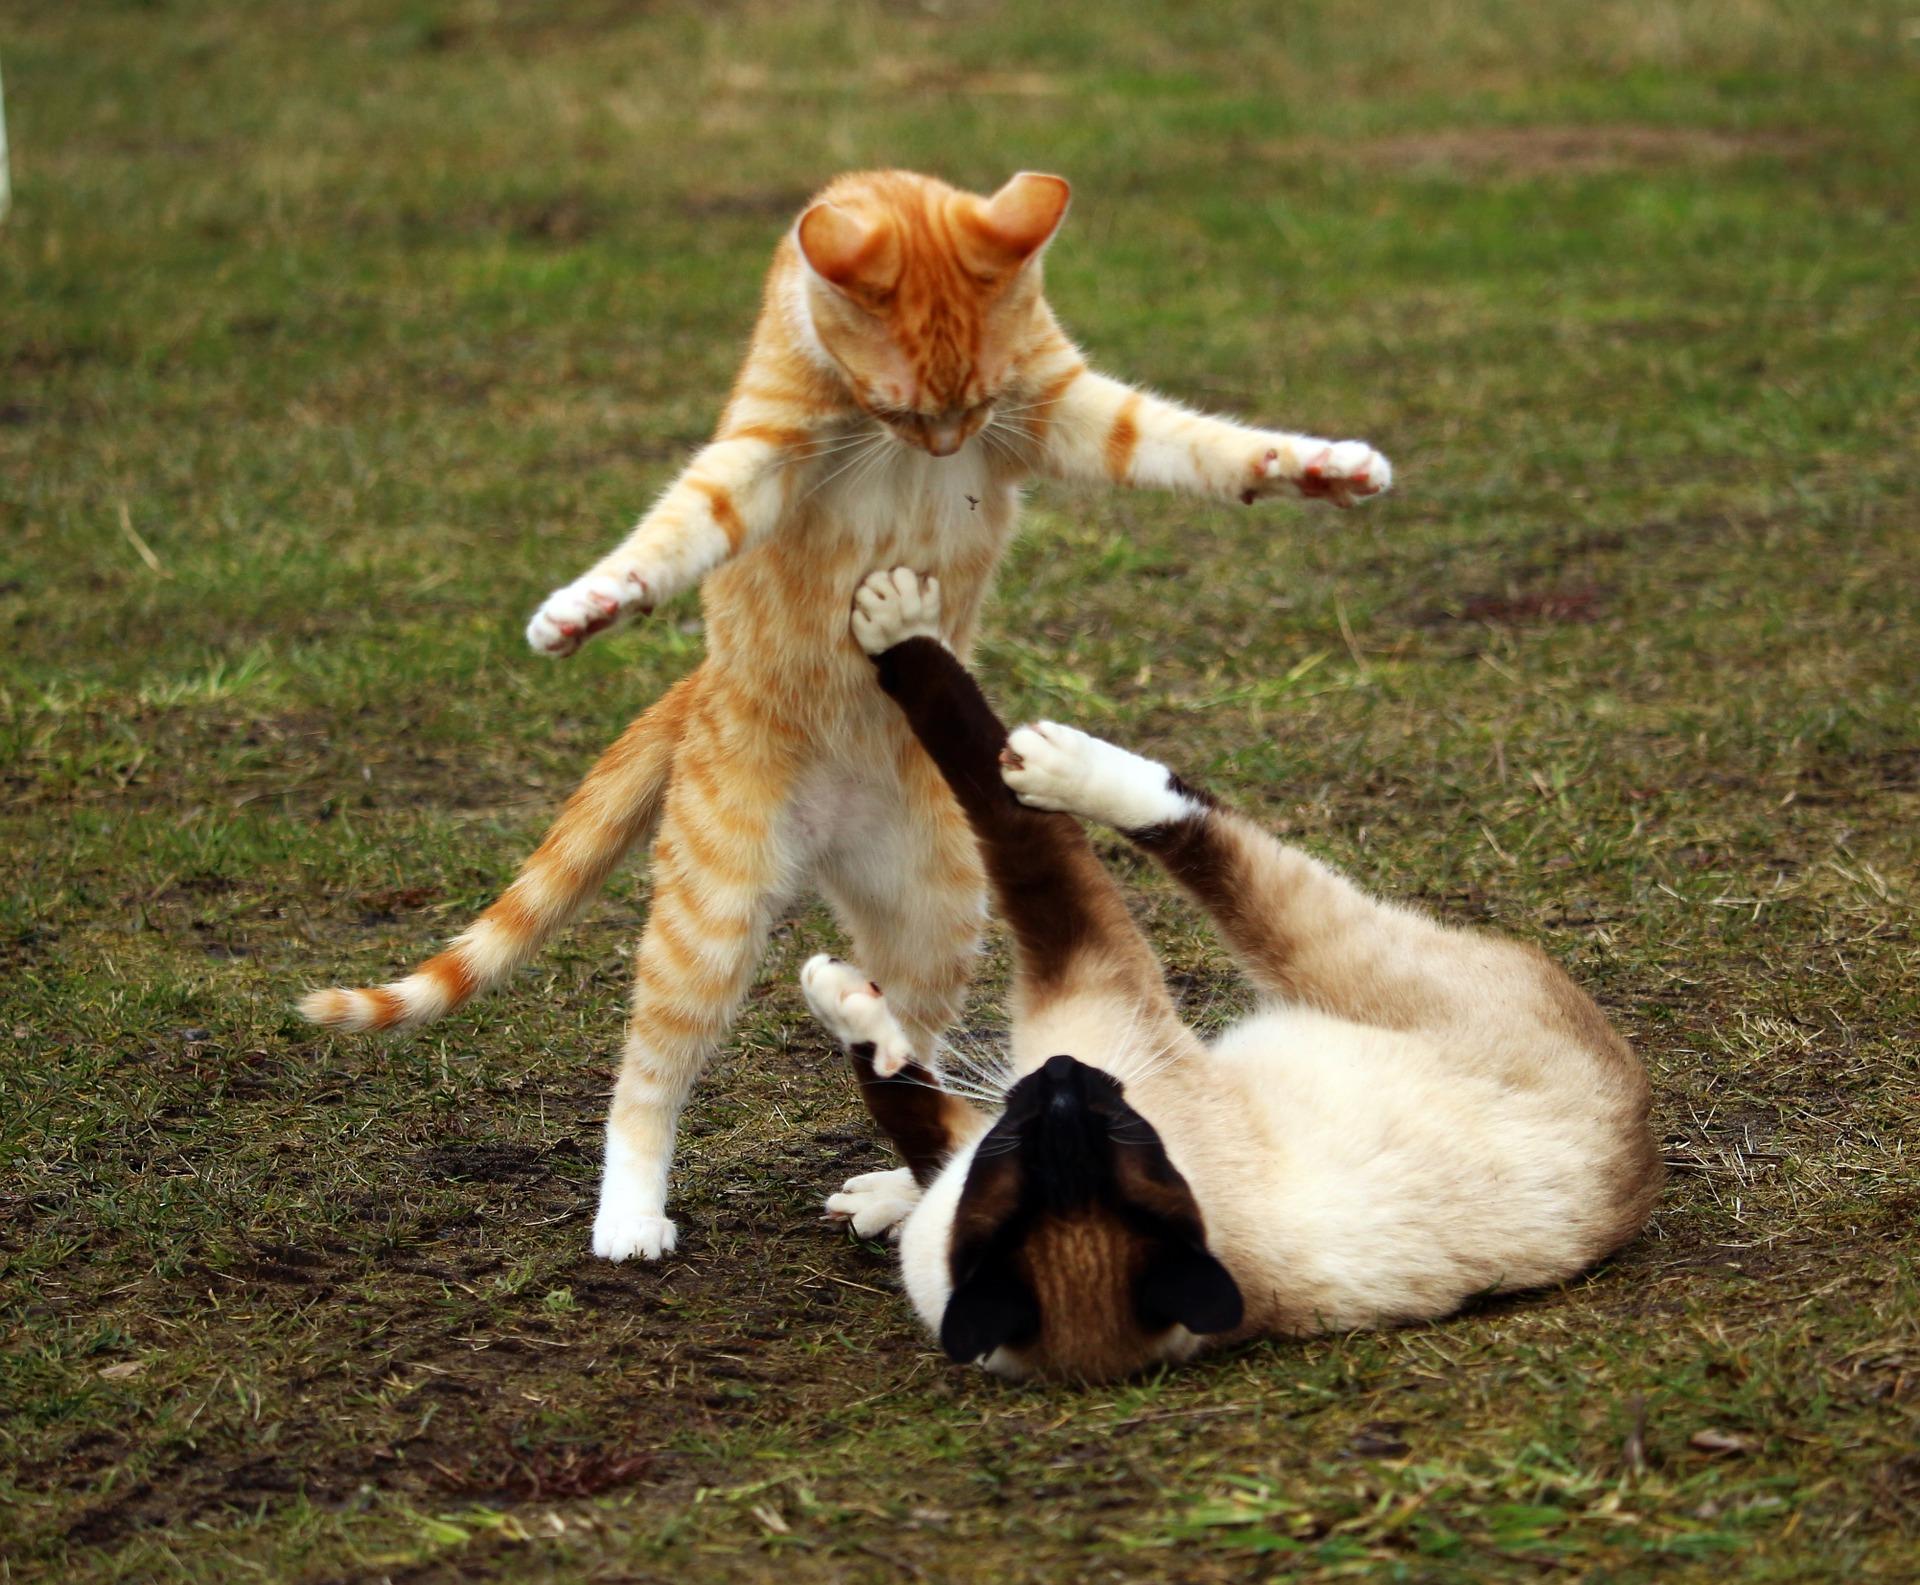 cat-1234950_1920.jpg